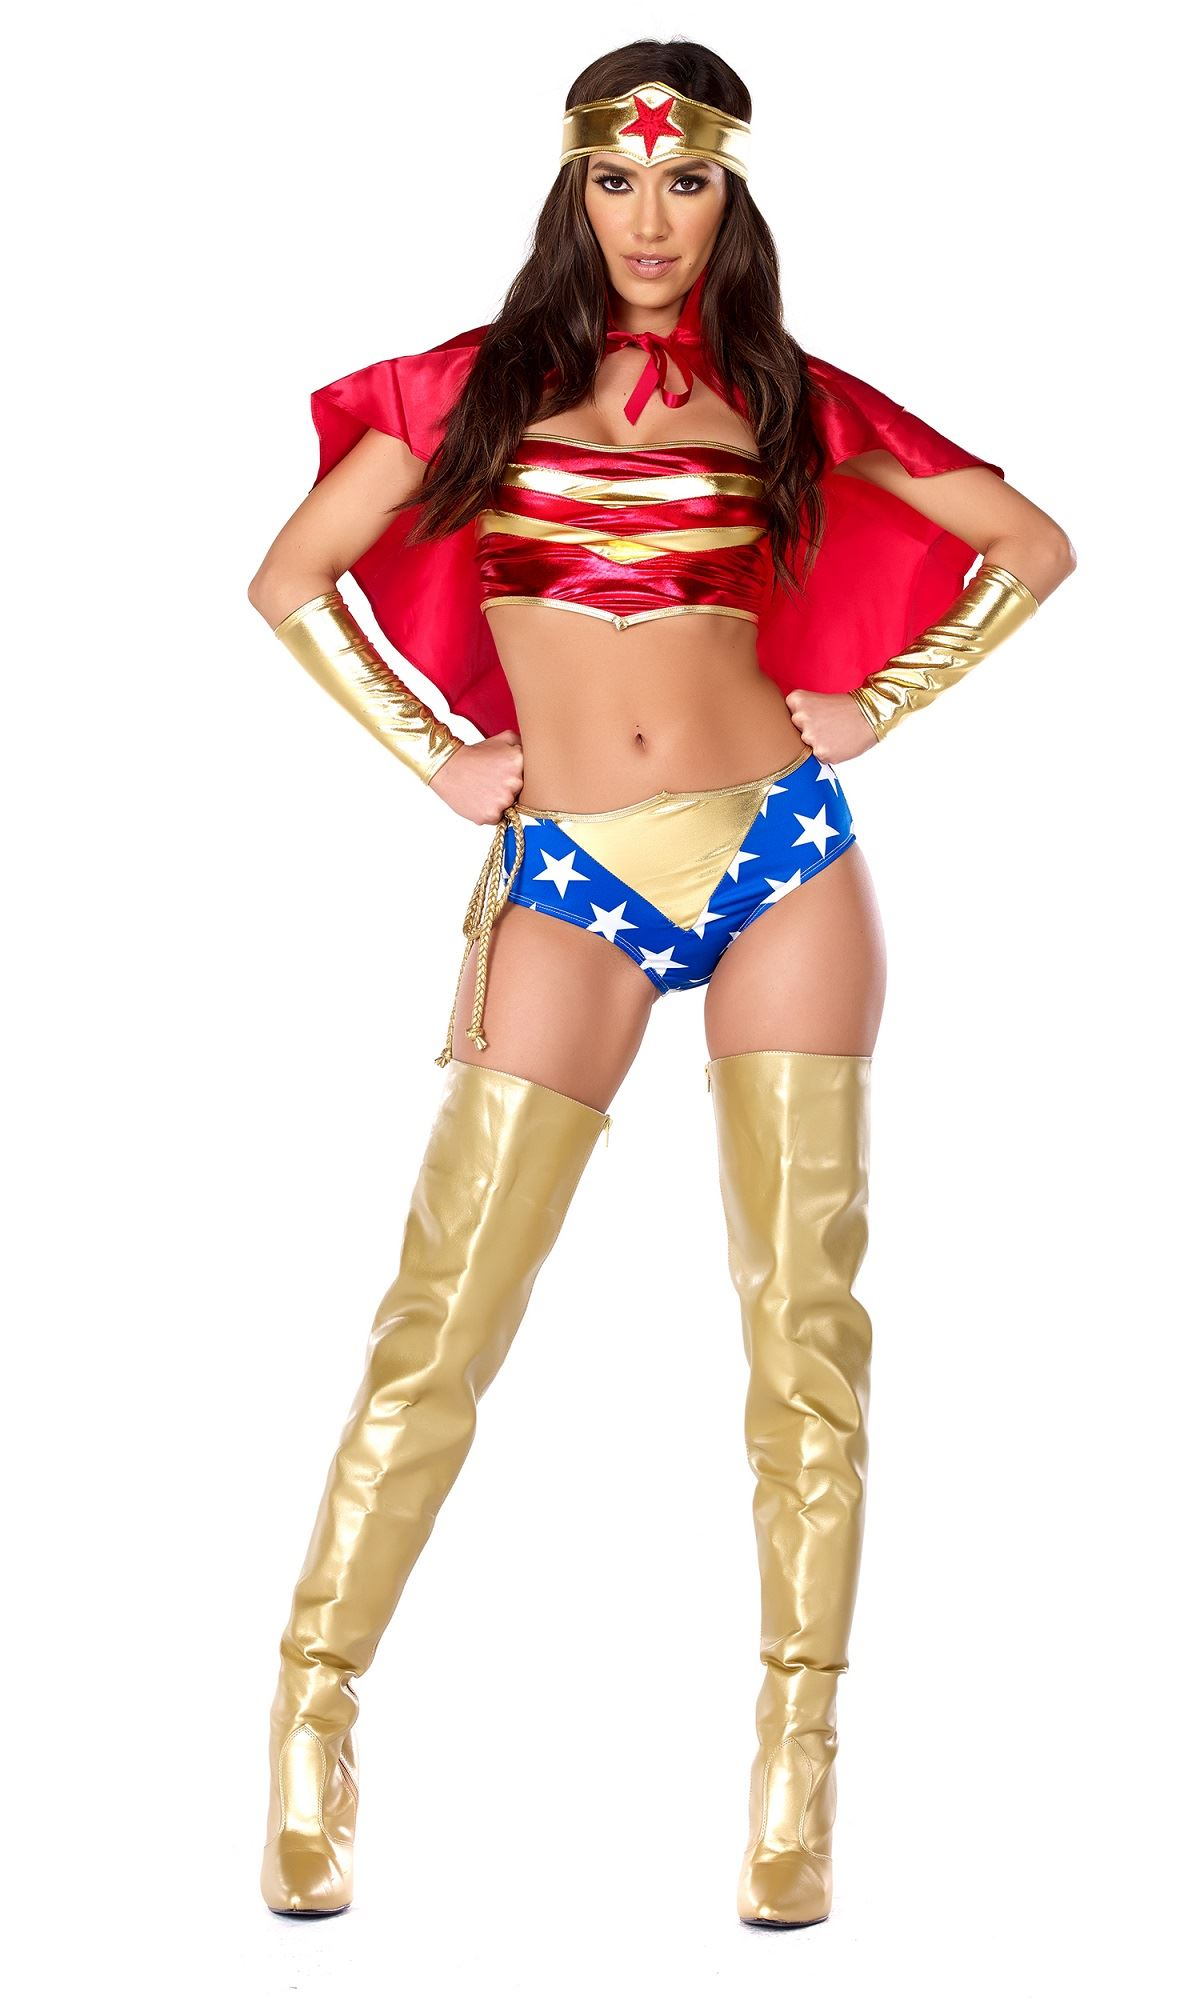 Wonder woman costume large-5938